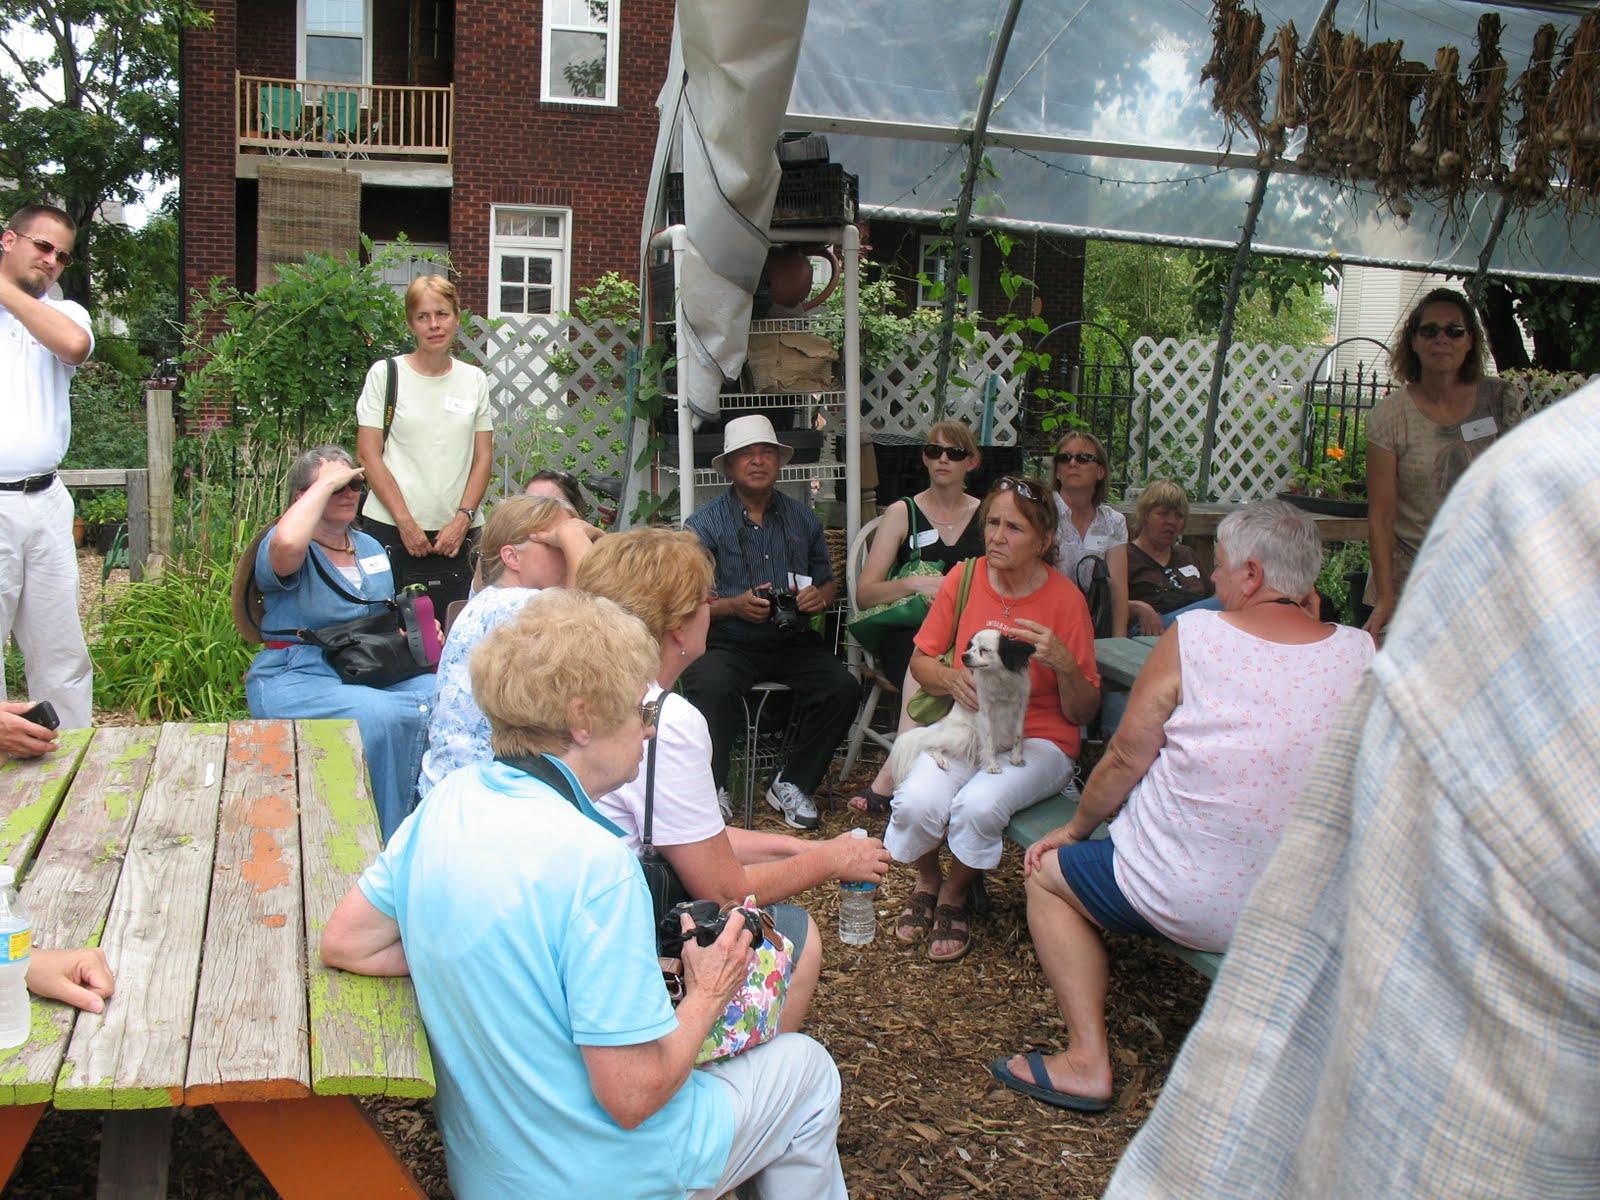 http://4.bp.blogspot.com/_Vx2FmMKE9w4/TD9NvcF1iZI/AAAAAAAAAOo/XaIKVon98JQ/s1600/urban+farm+tour+-+Everyone+learning,+even+the+neighborhood+pooch.JPG